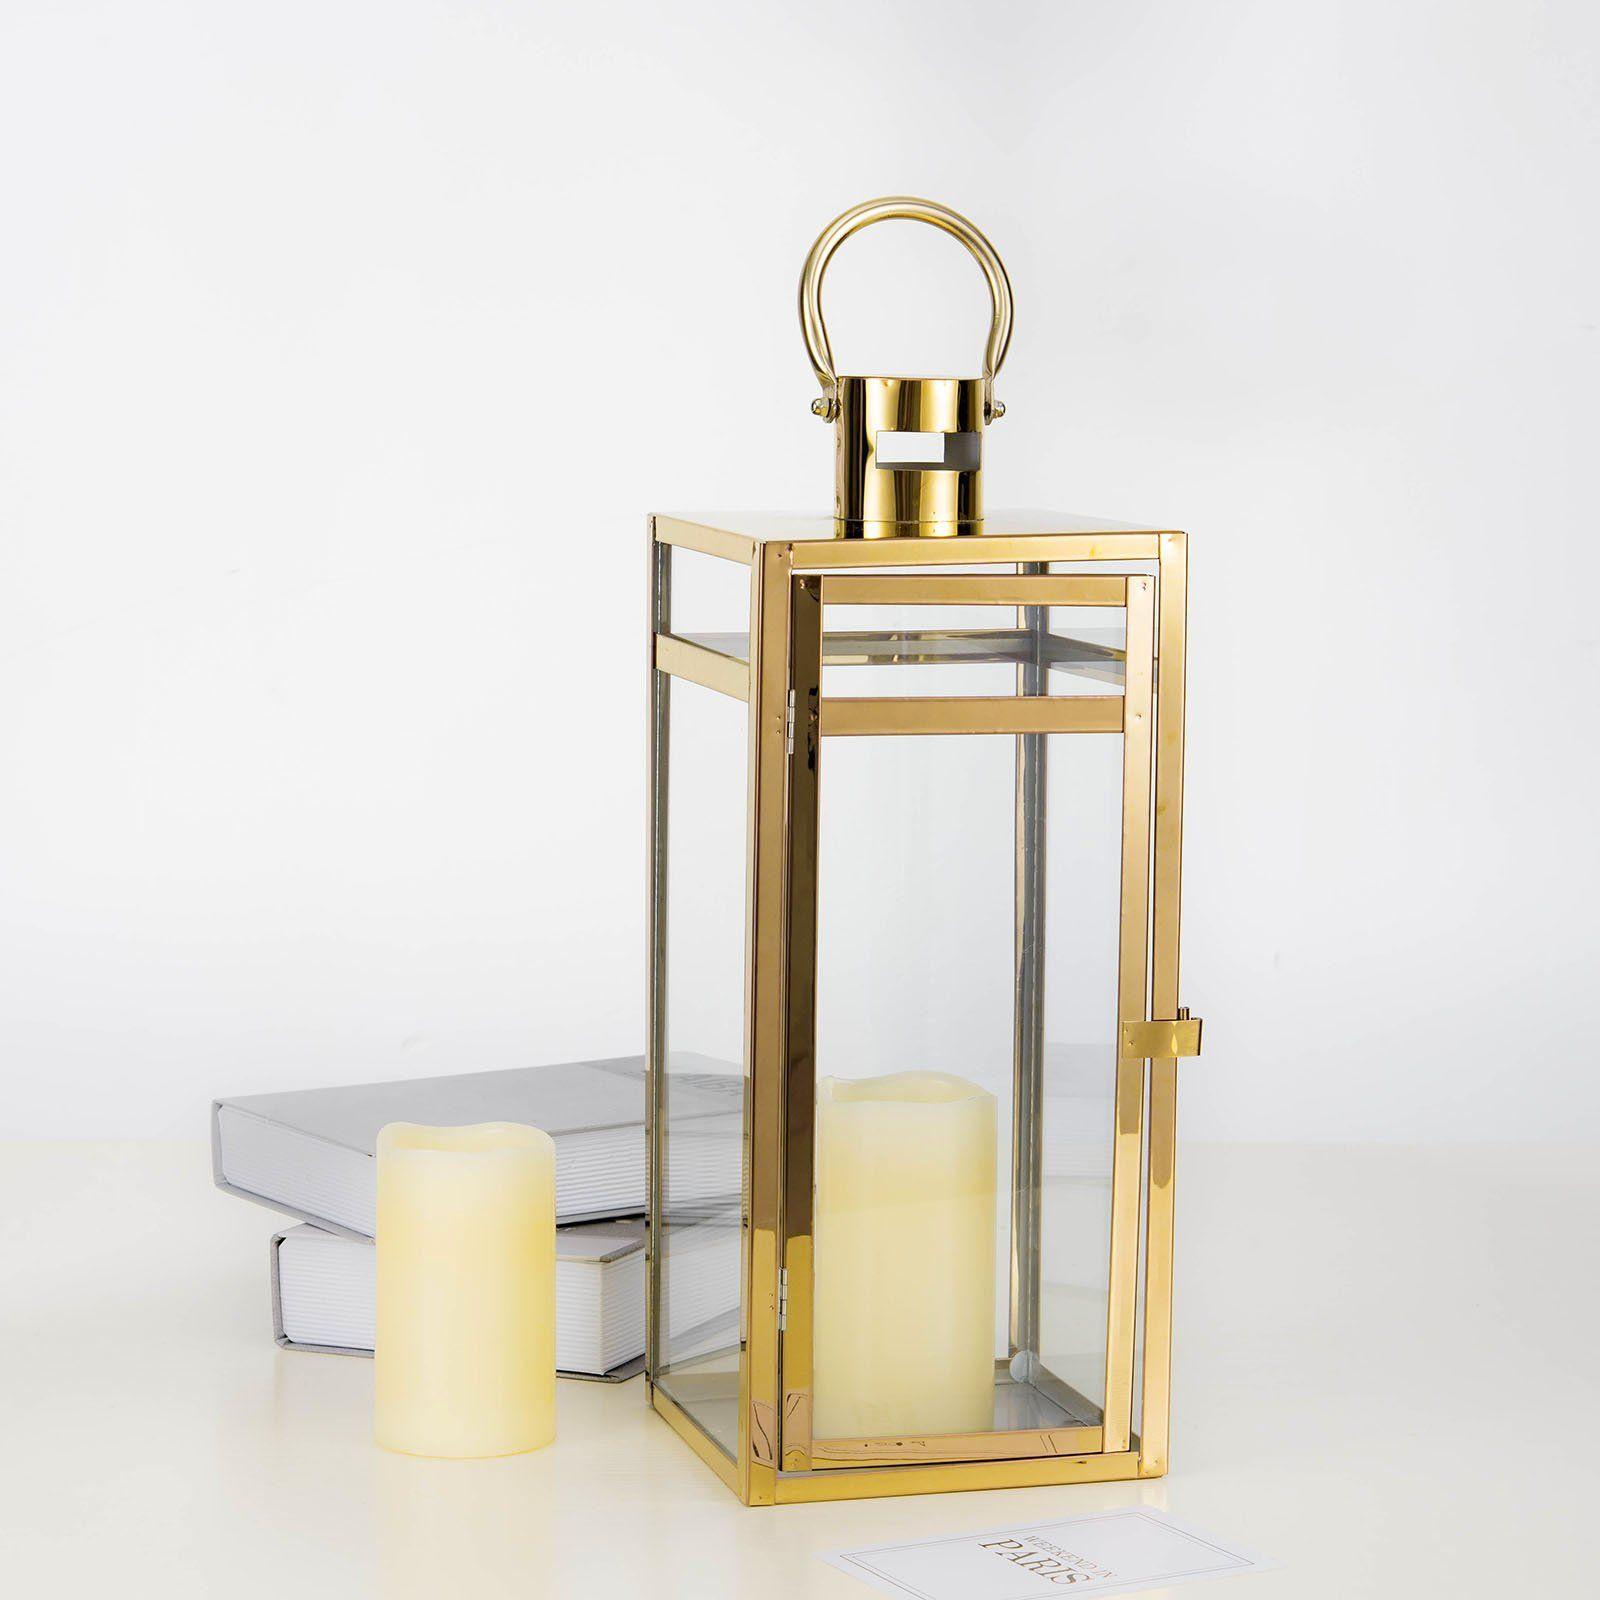 17 Gold Stainless Steel Metal Lantern Centerpieces Outdoor Candle Lanterns In 2020 Metal Lanterns Candle Lanterns Candle Holders